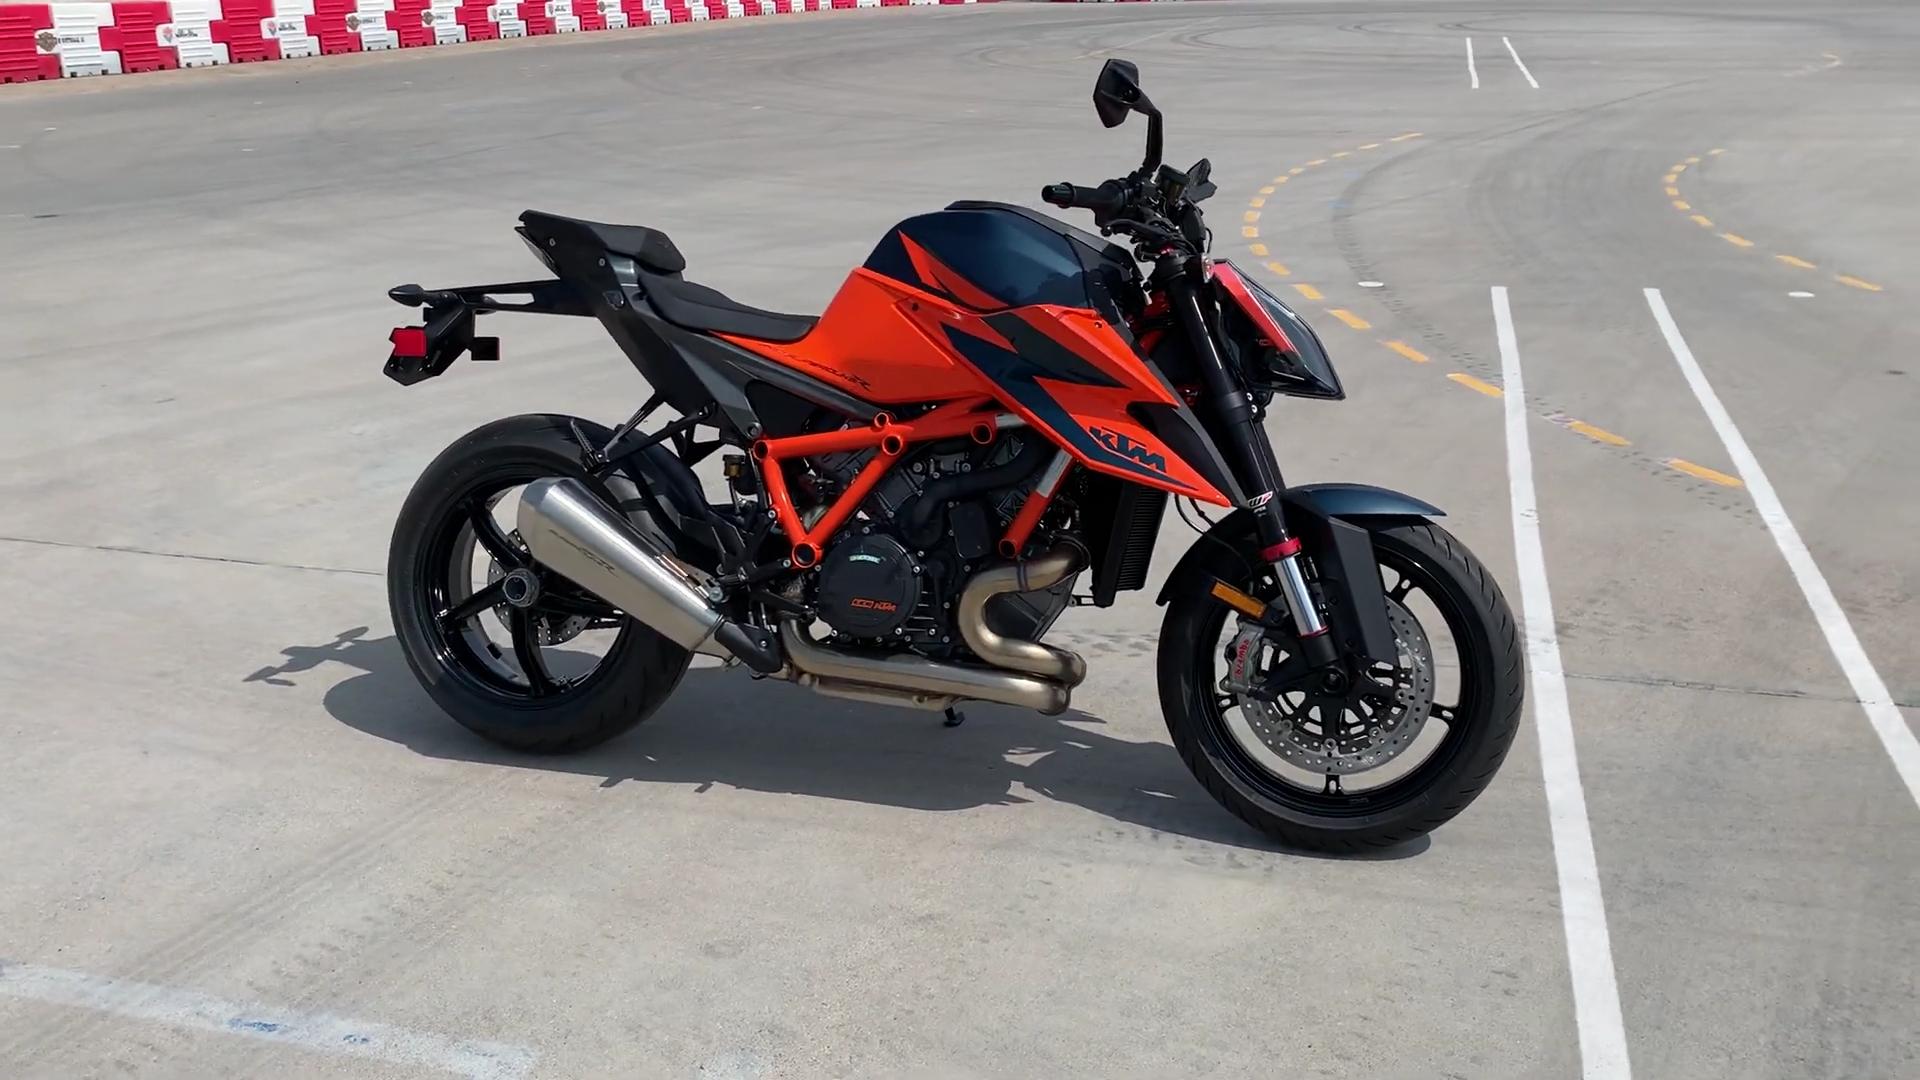 2020 KTM 1290 SUPER DUKE R WhatsApp +13236413248